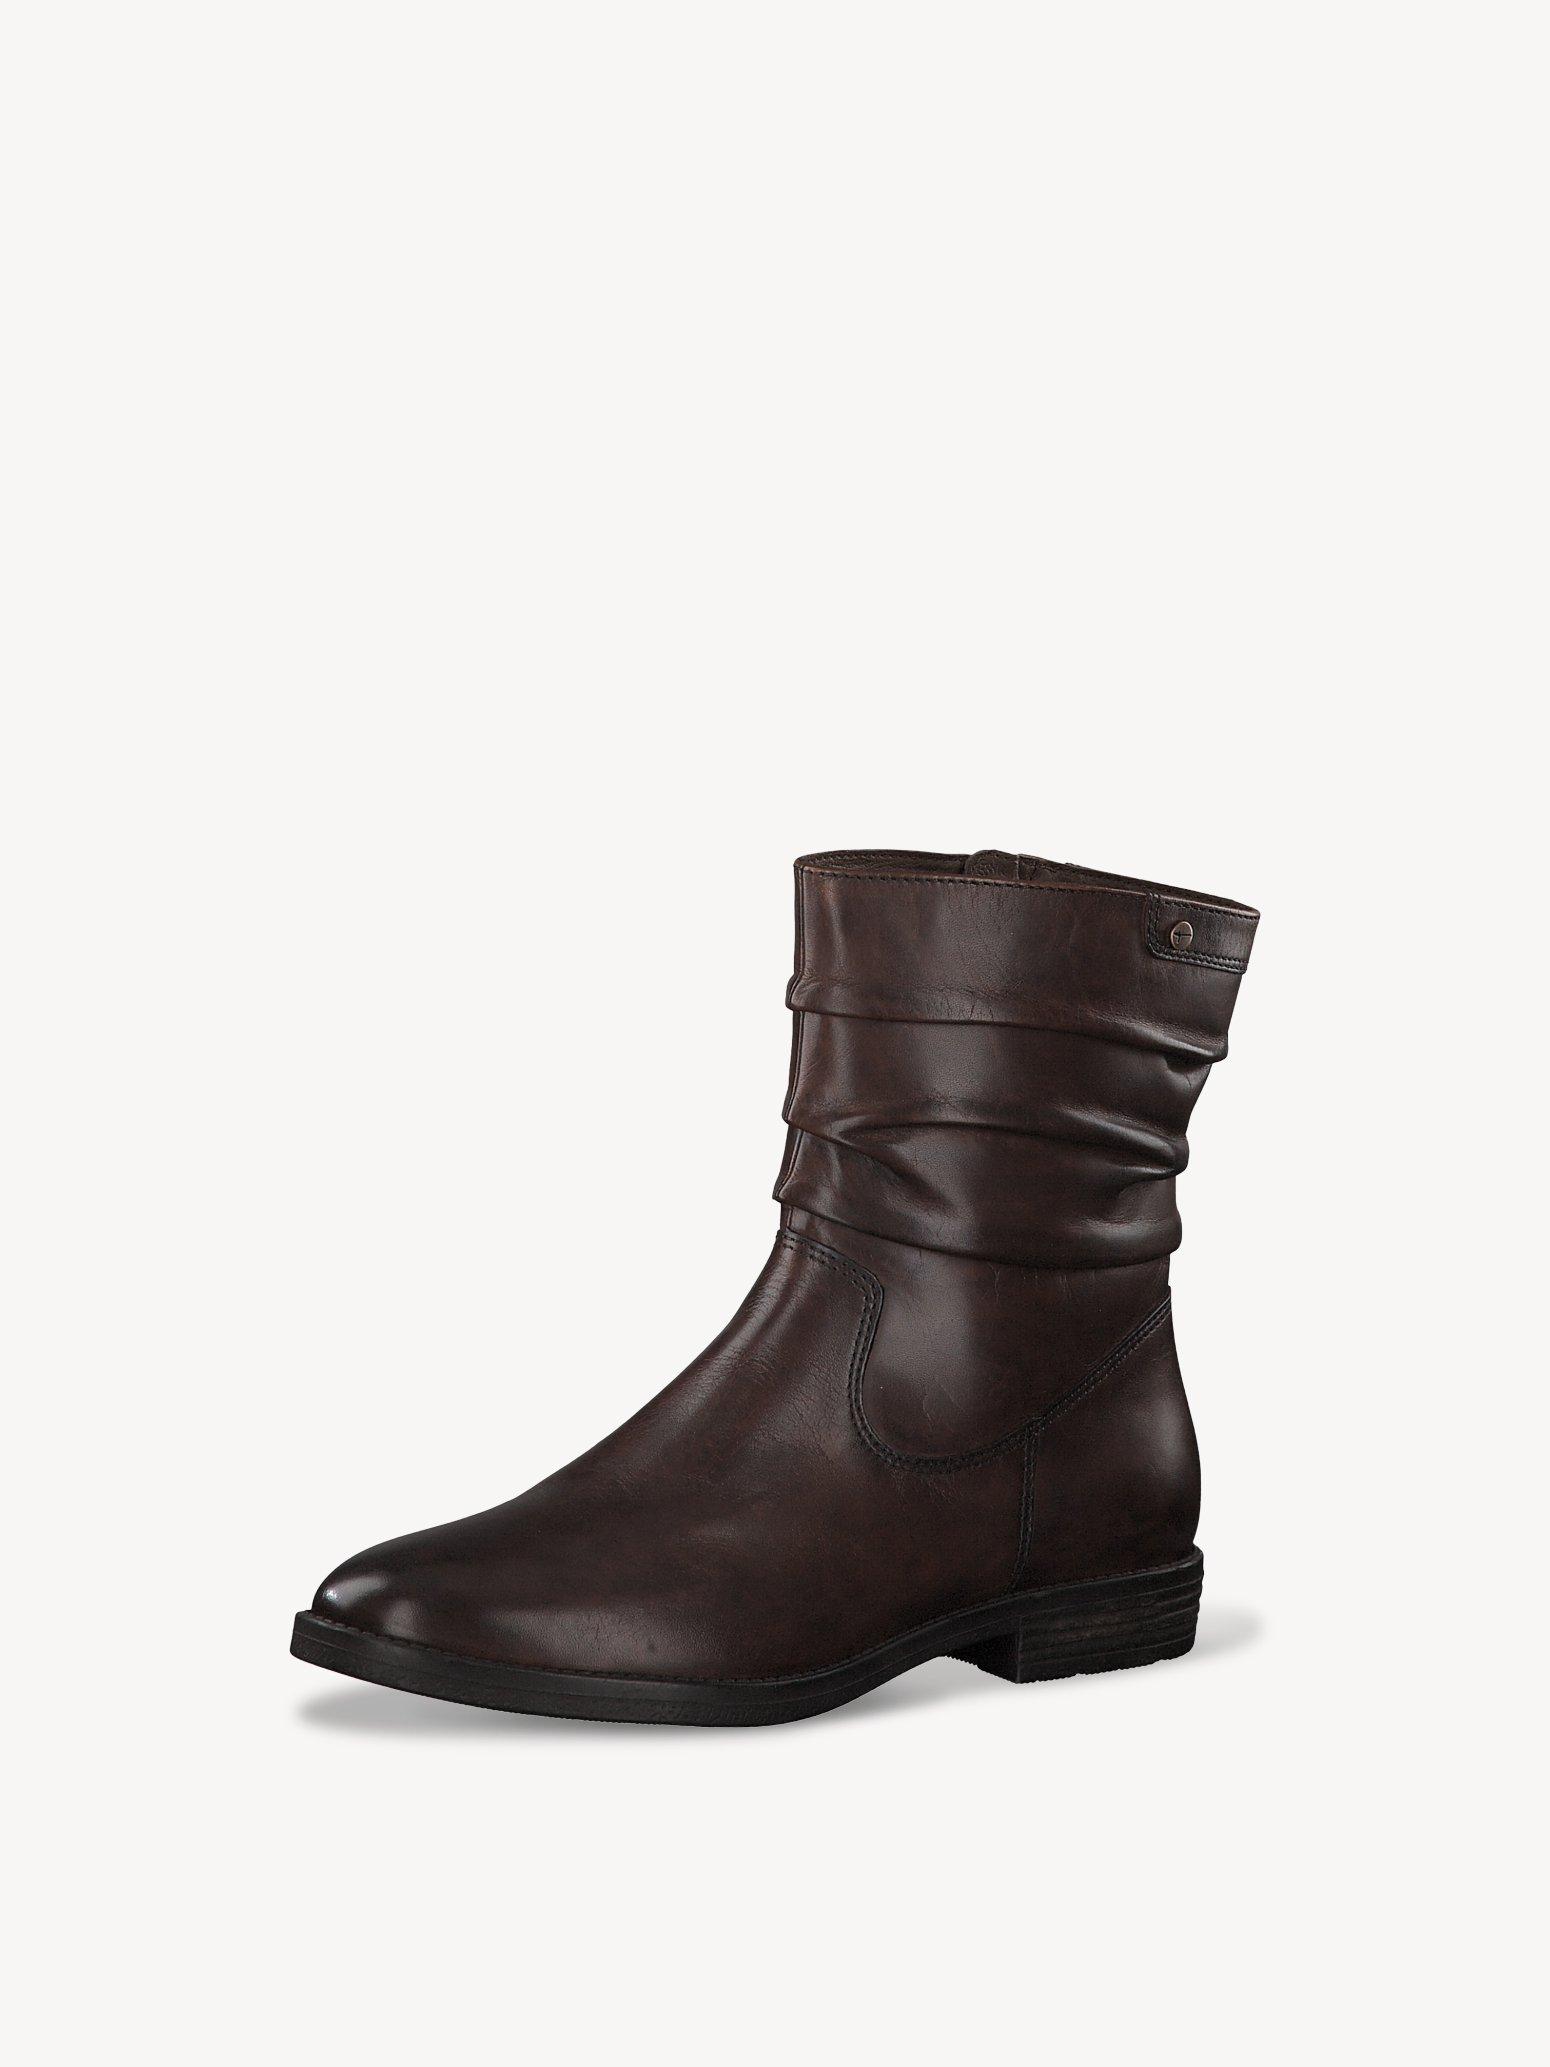 Ботинки Tamaris 1-1-25914-25-305